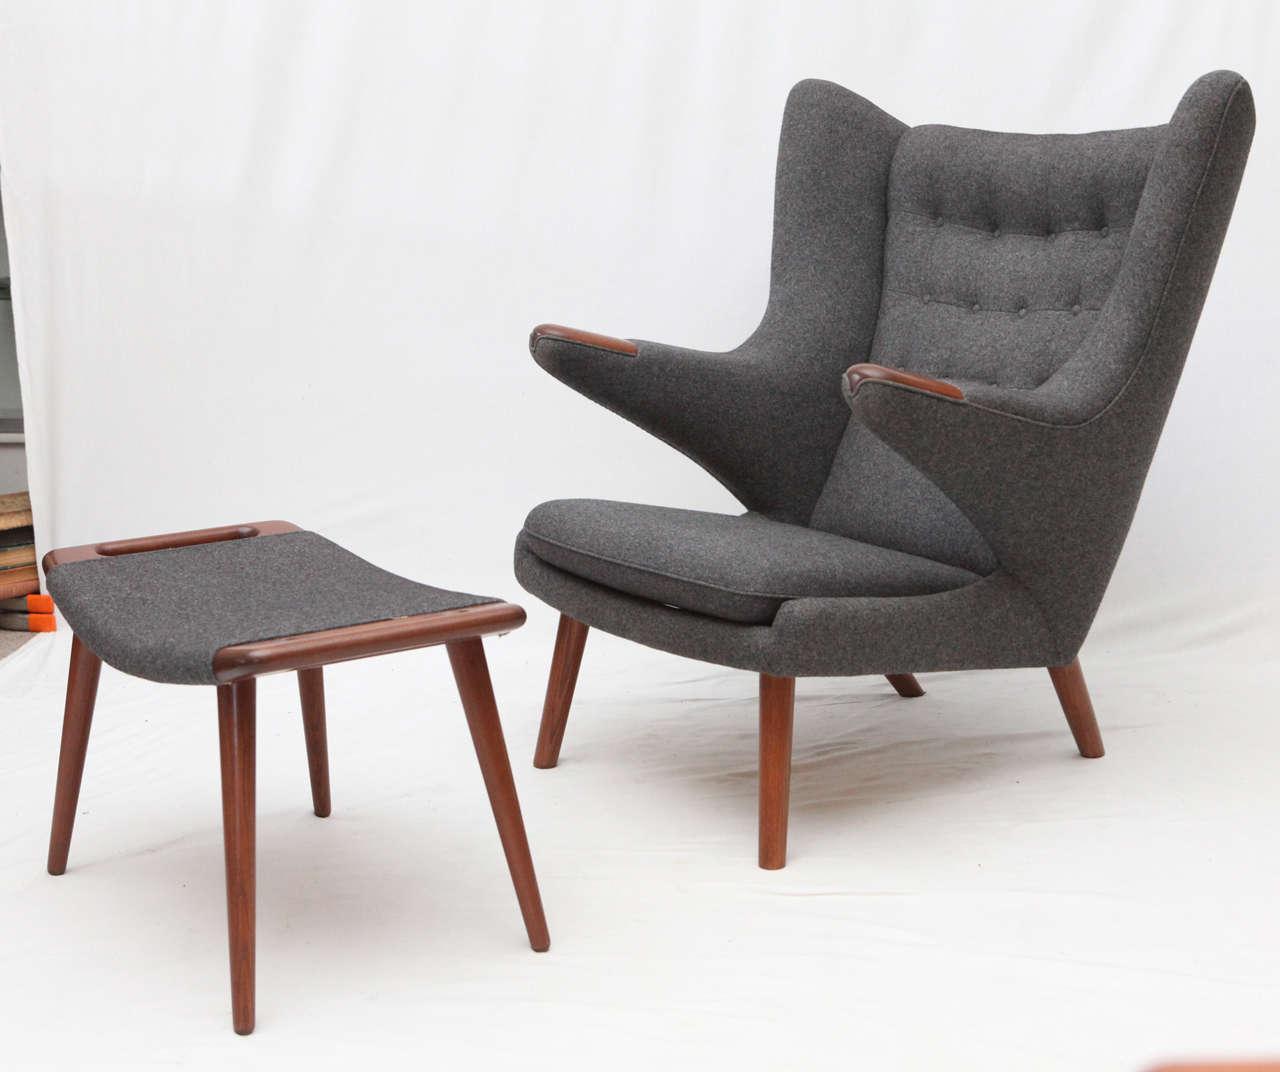 Hans Wegner Quot Papa Bear Quot Chair And Ottoman At 1stdibs